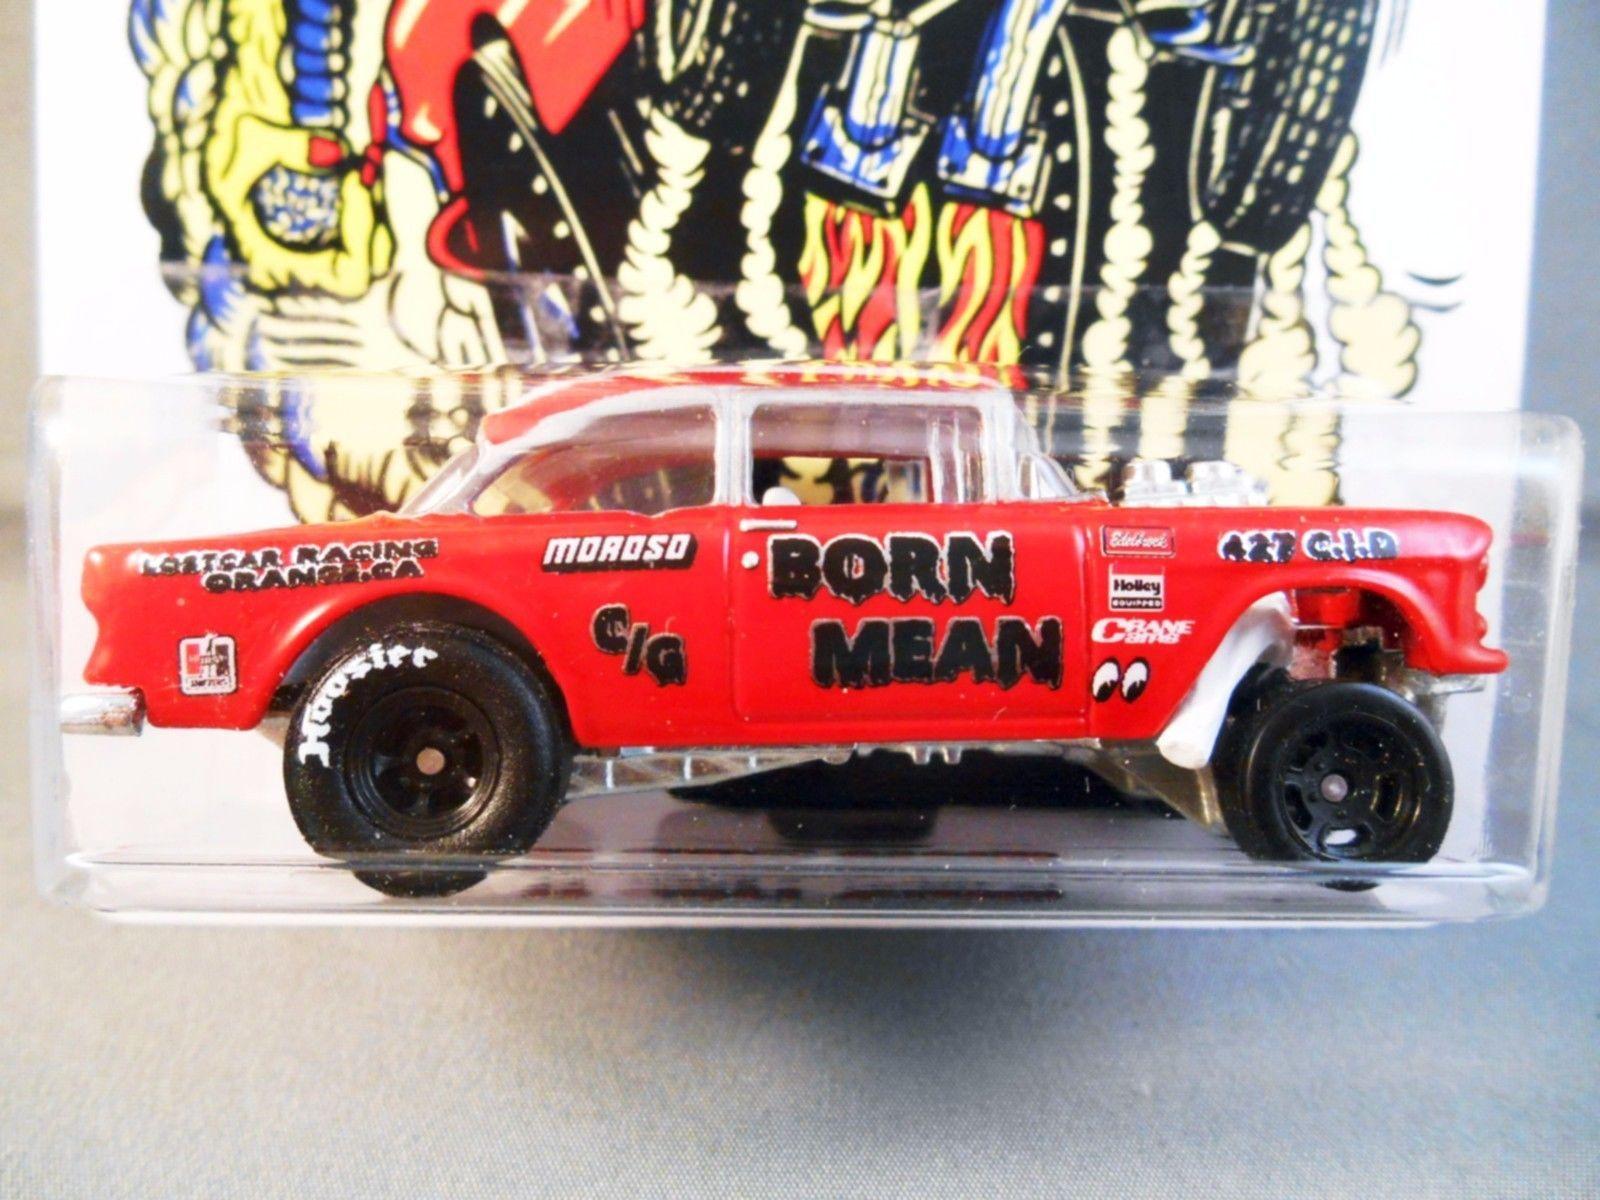 Hot Wheels Custom Born Mean 55 Chevy Gasser Hot Wheels Garage